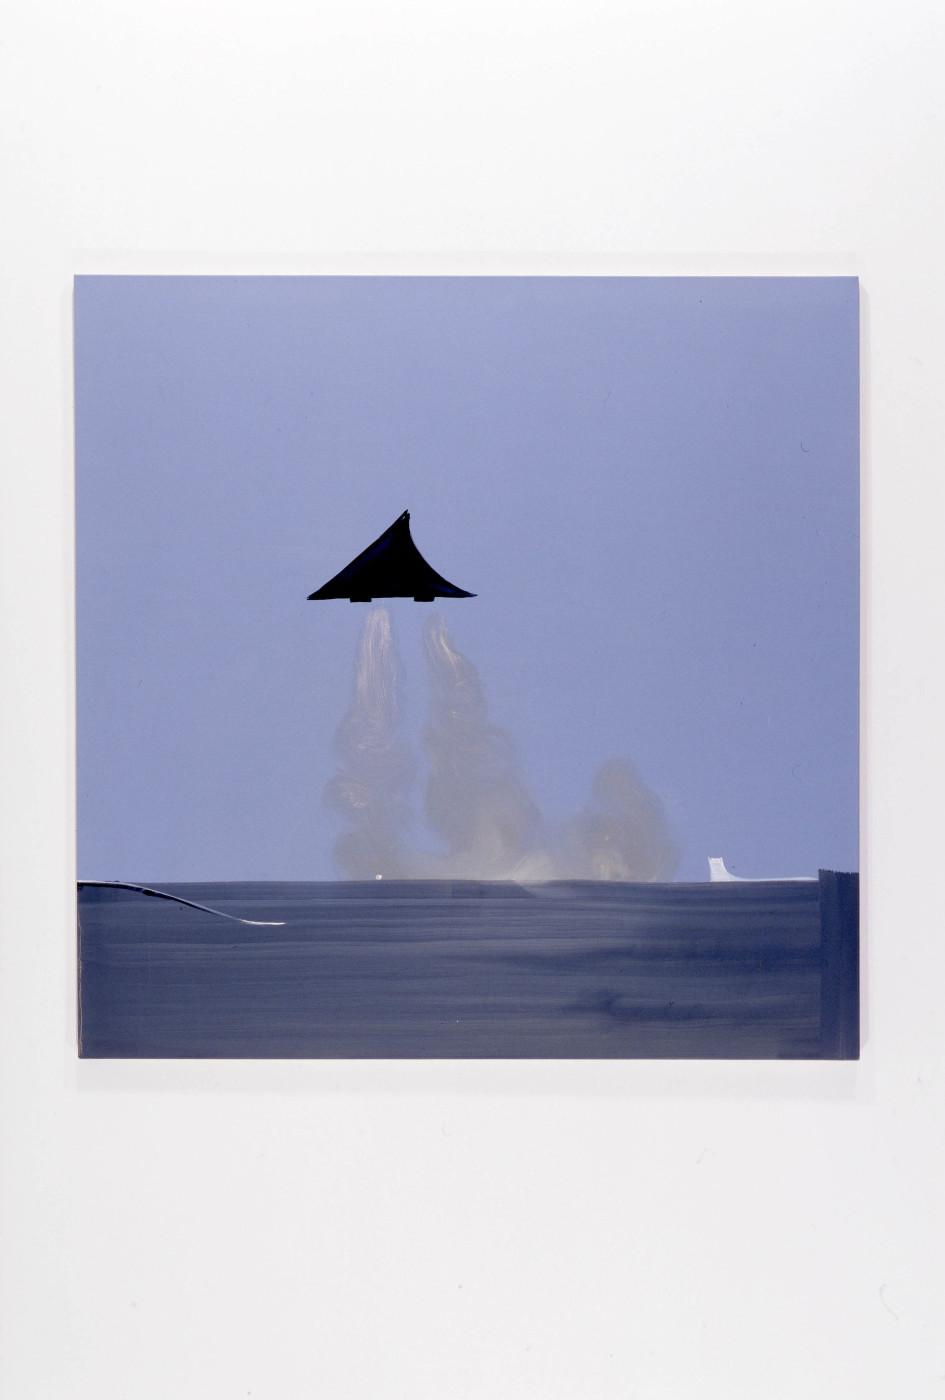 "<div class=""title""><em>Concorde</em>, 2007</div><div class=""medium"">oil on canvas</div><div class=""dimensions"">160.02 x 160.02 x 2.54 cm<br />63 x 63 x 1 in.</div>"